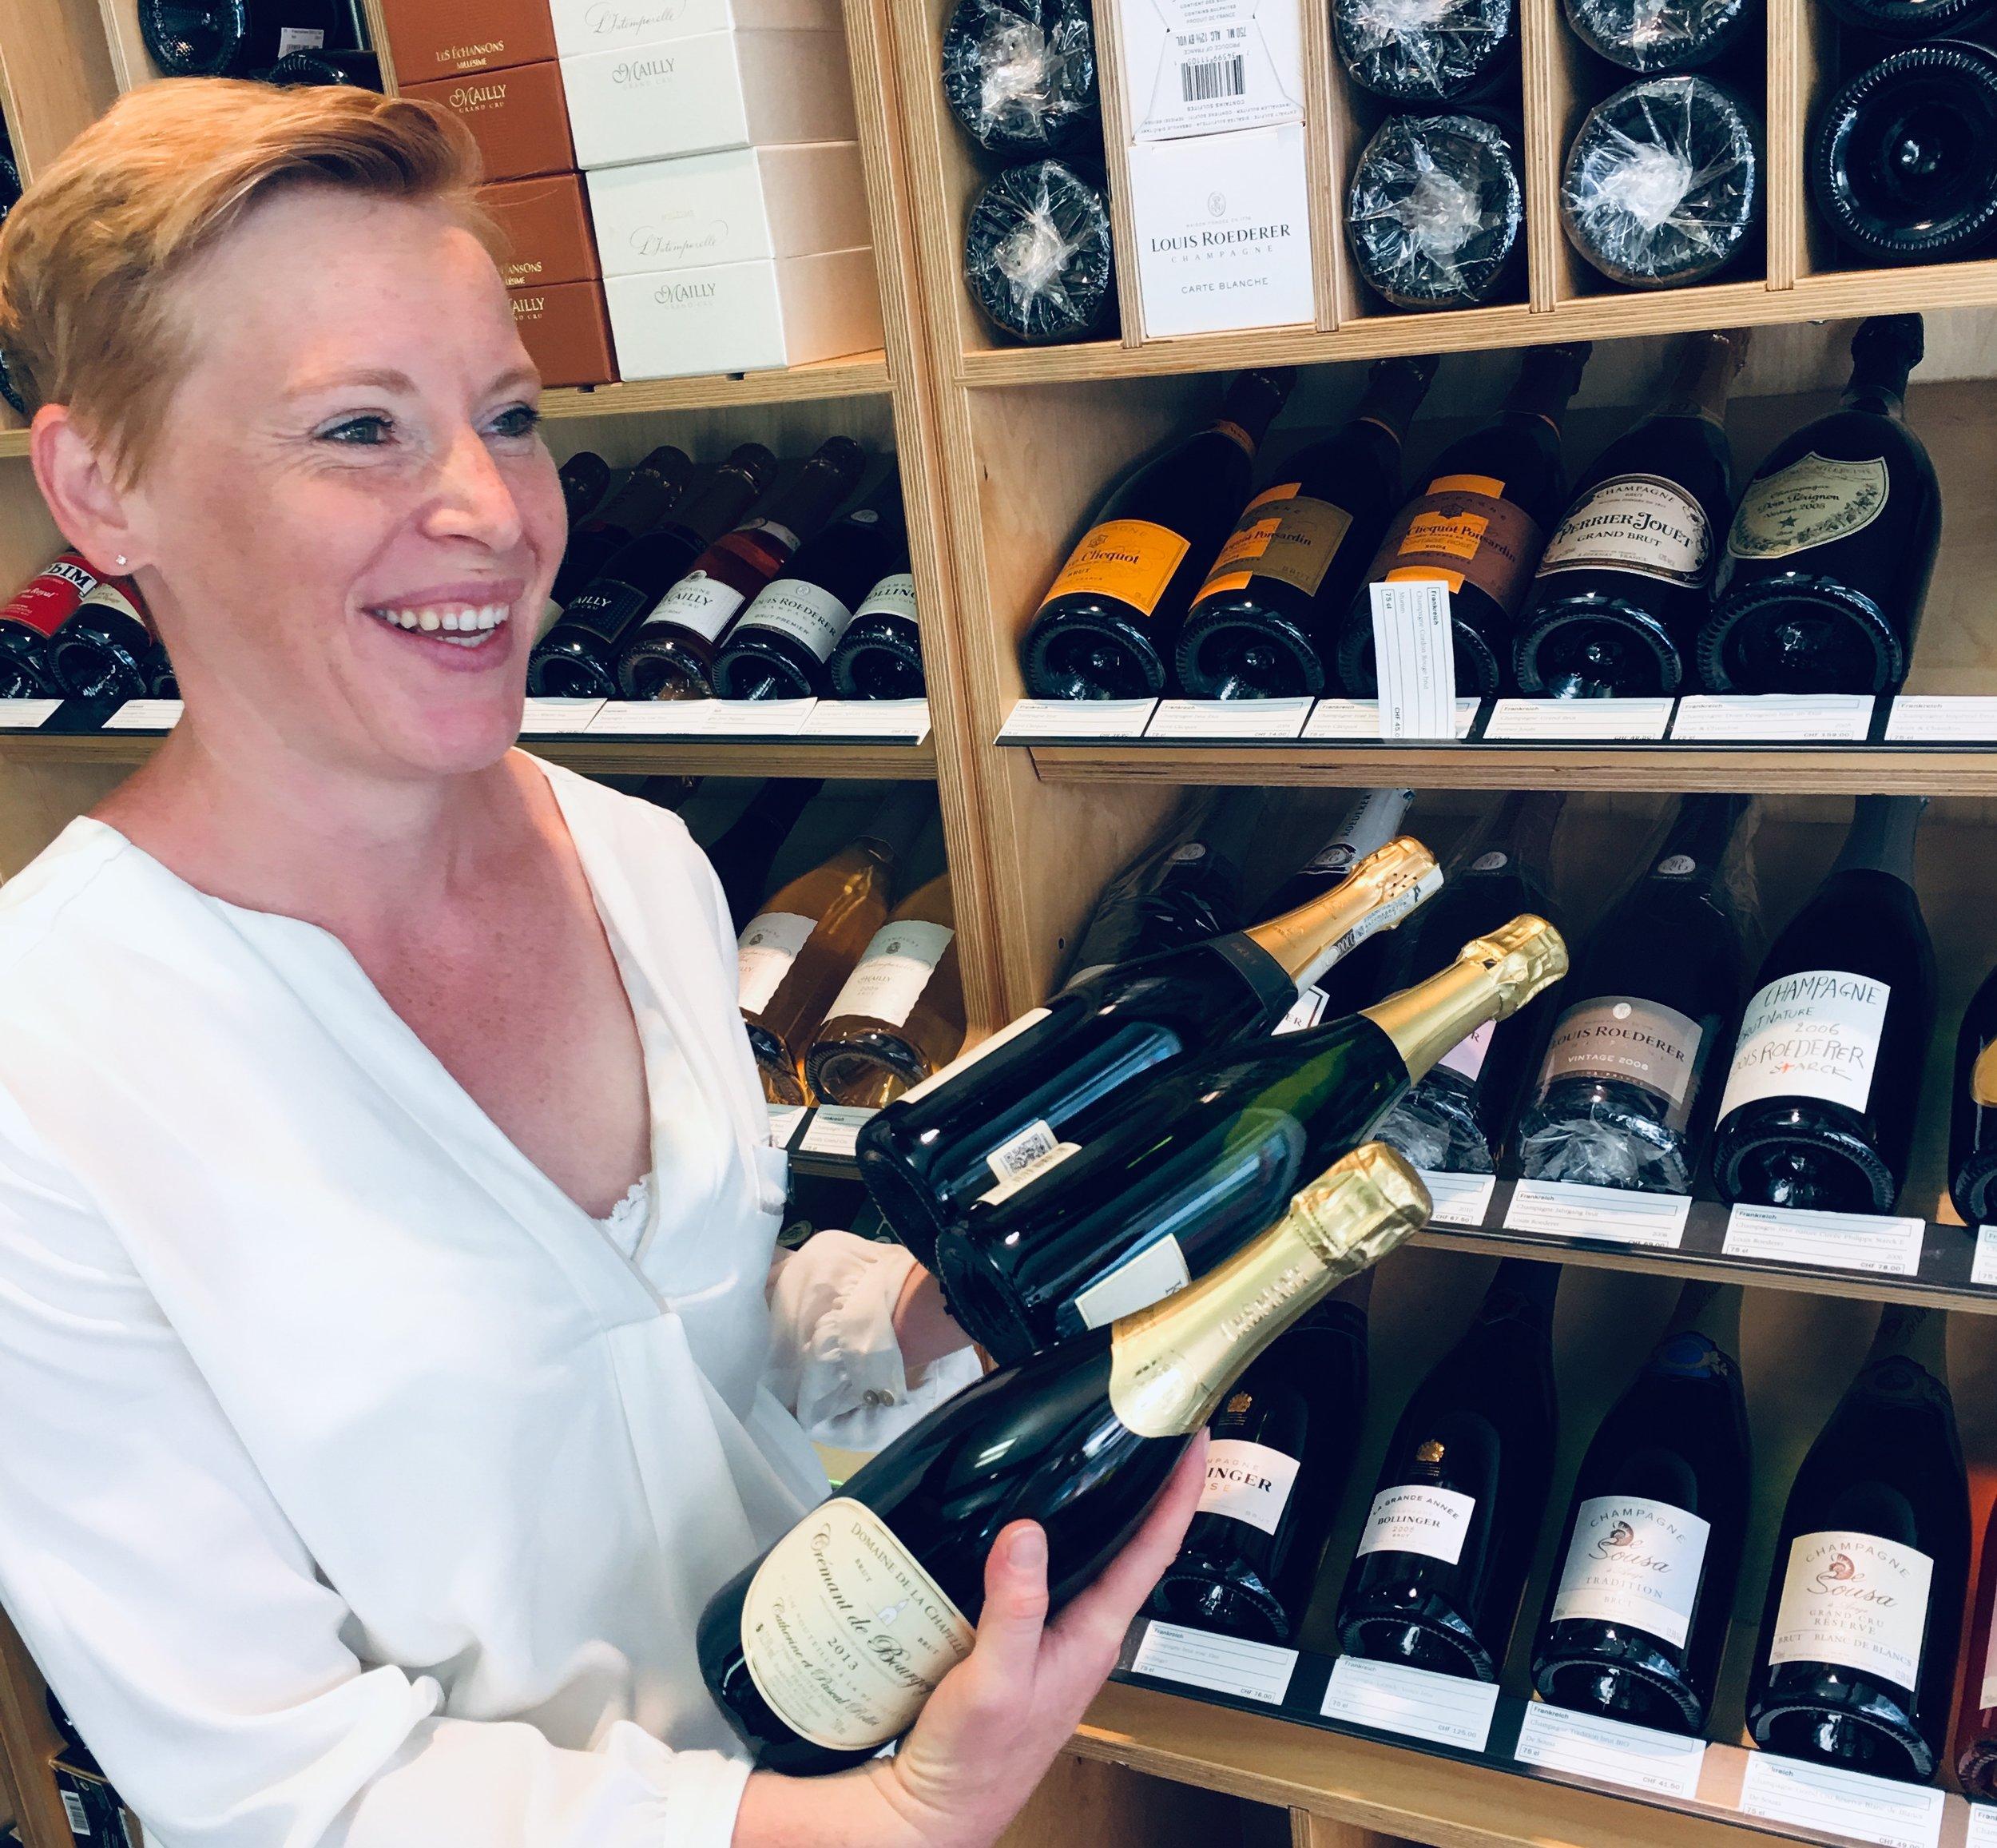 Thanks Sandie for being the Wine Guru on Wheels - happy wine shopper!